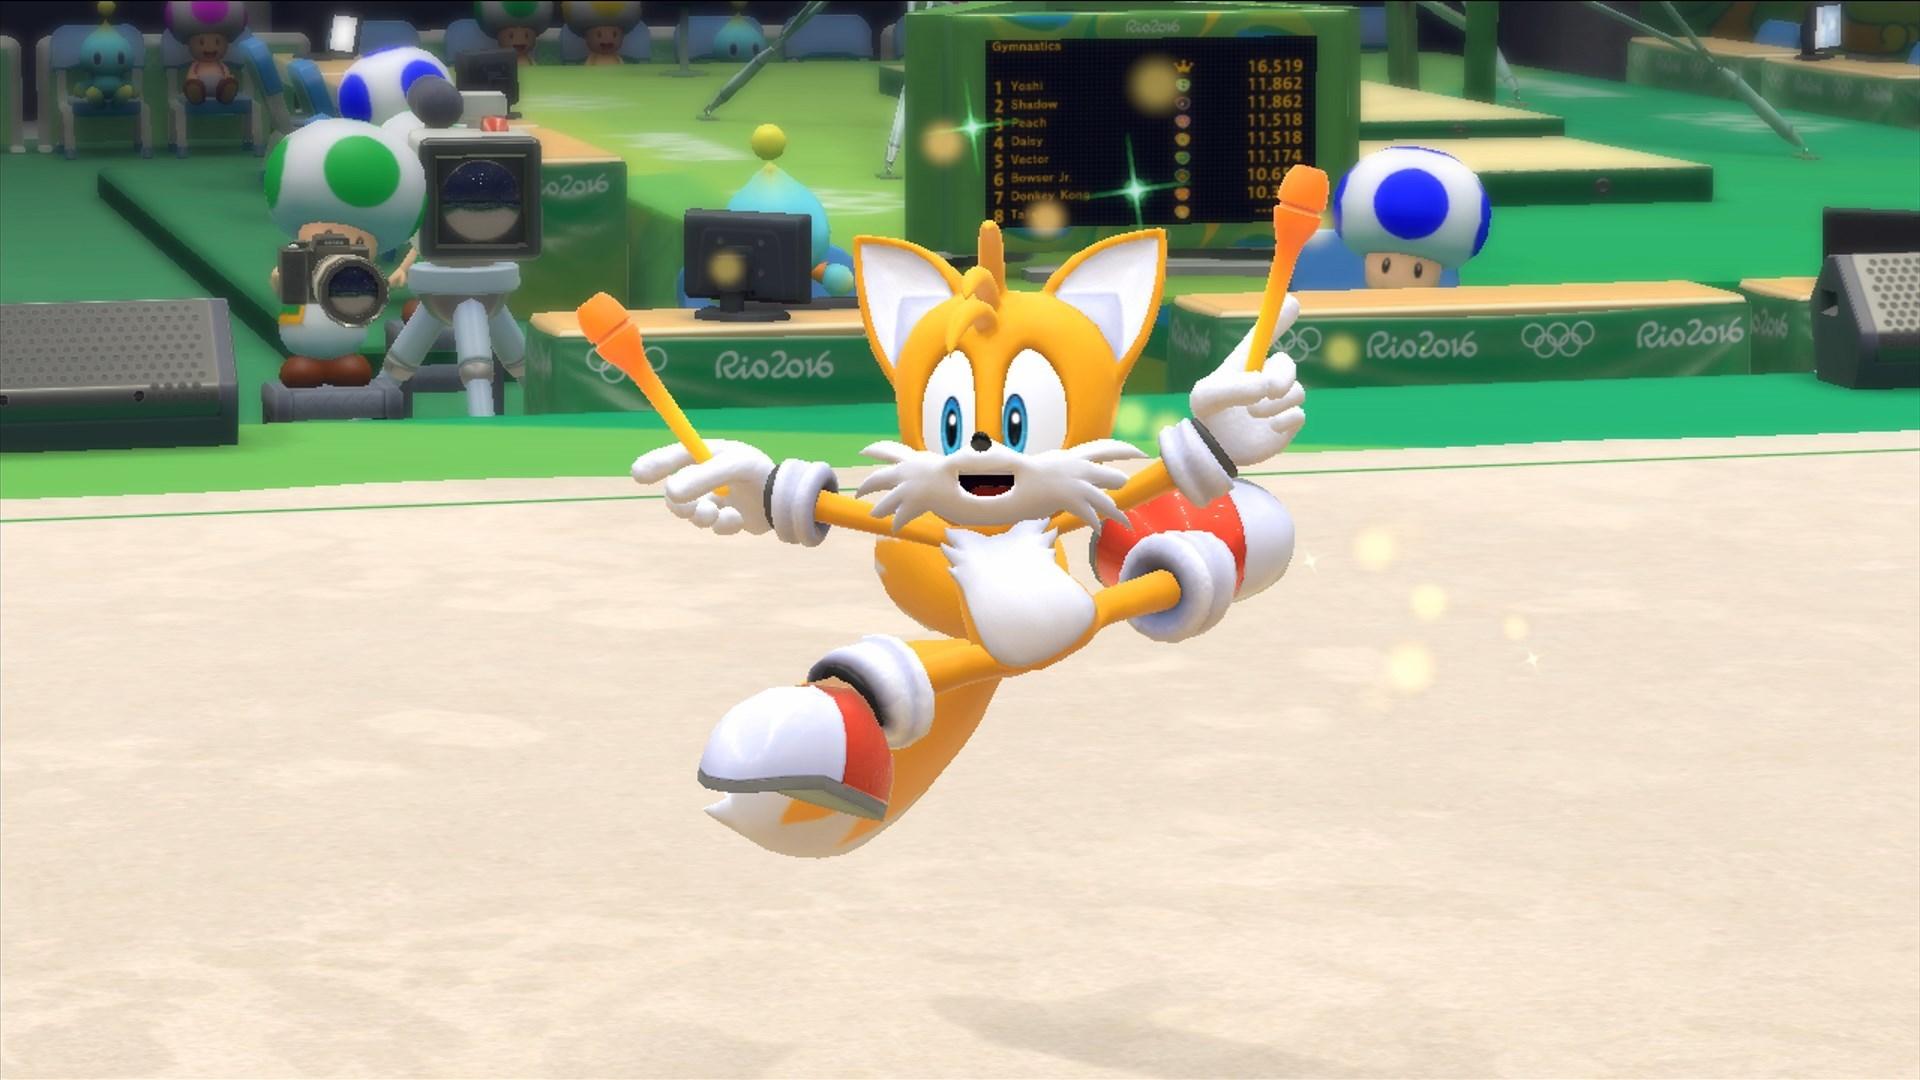 WiiU_MSRio2016_OlympicGames_screen_05_bmp_jpgcopy